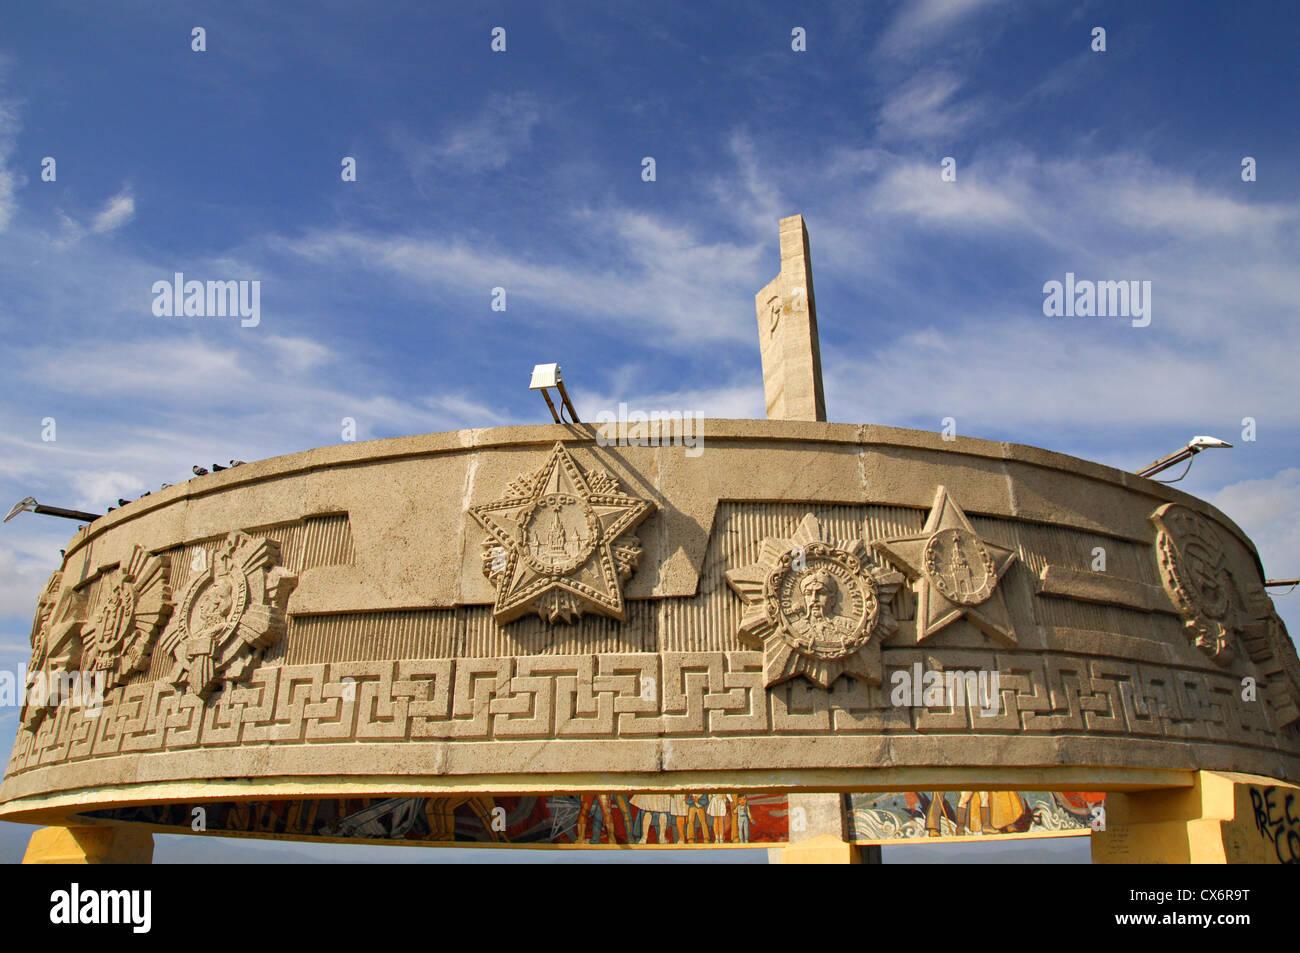 Soviet memorial dedicated to cosmonauts from kaliningrad - Soviet Monument In Ulaanbaatar Mongolia Stock Image